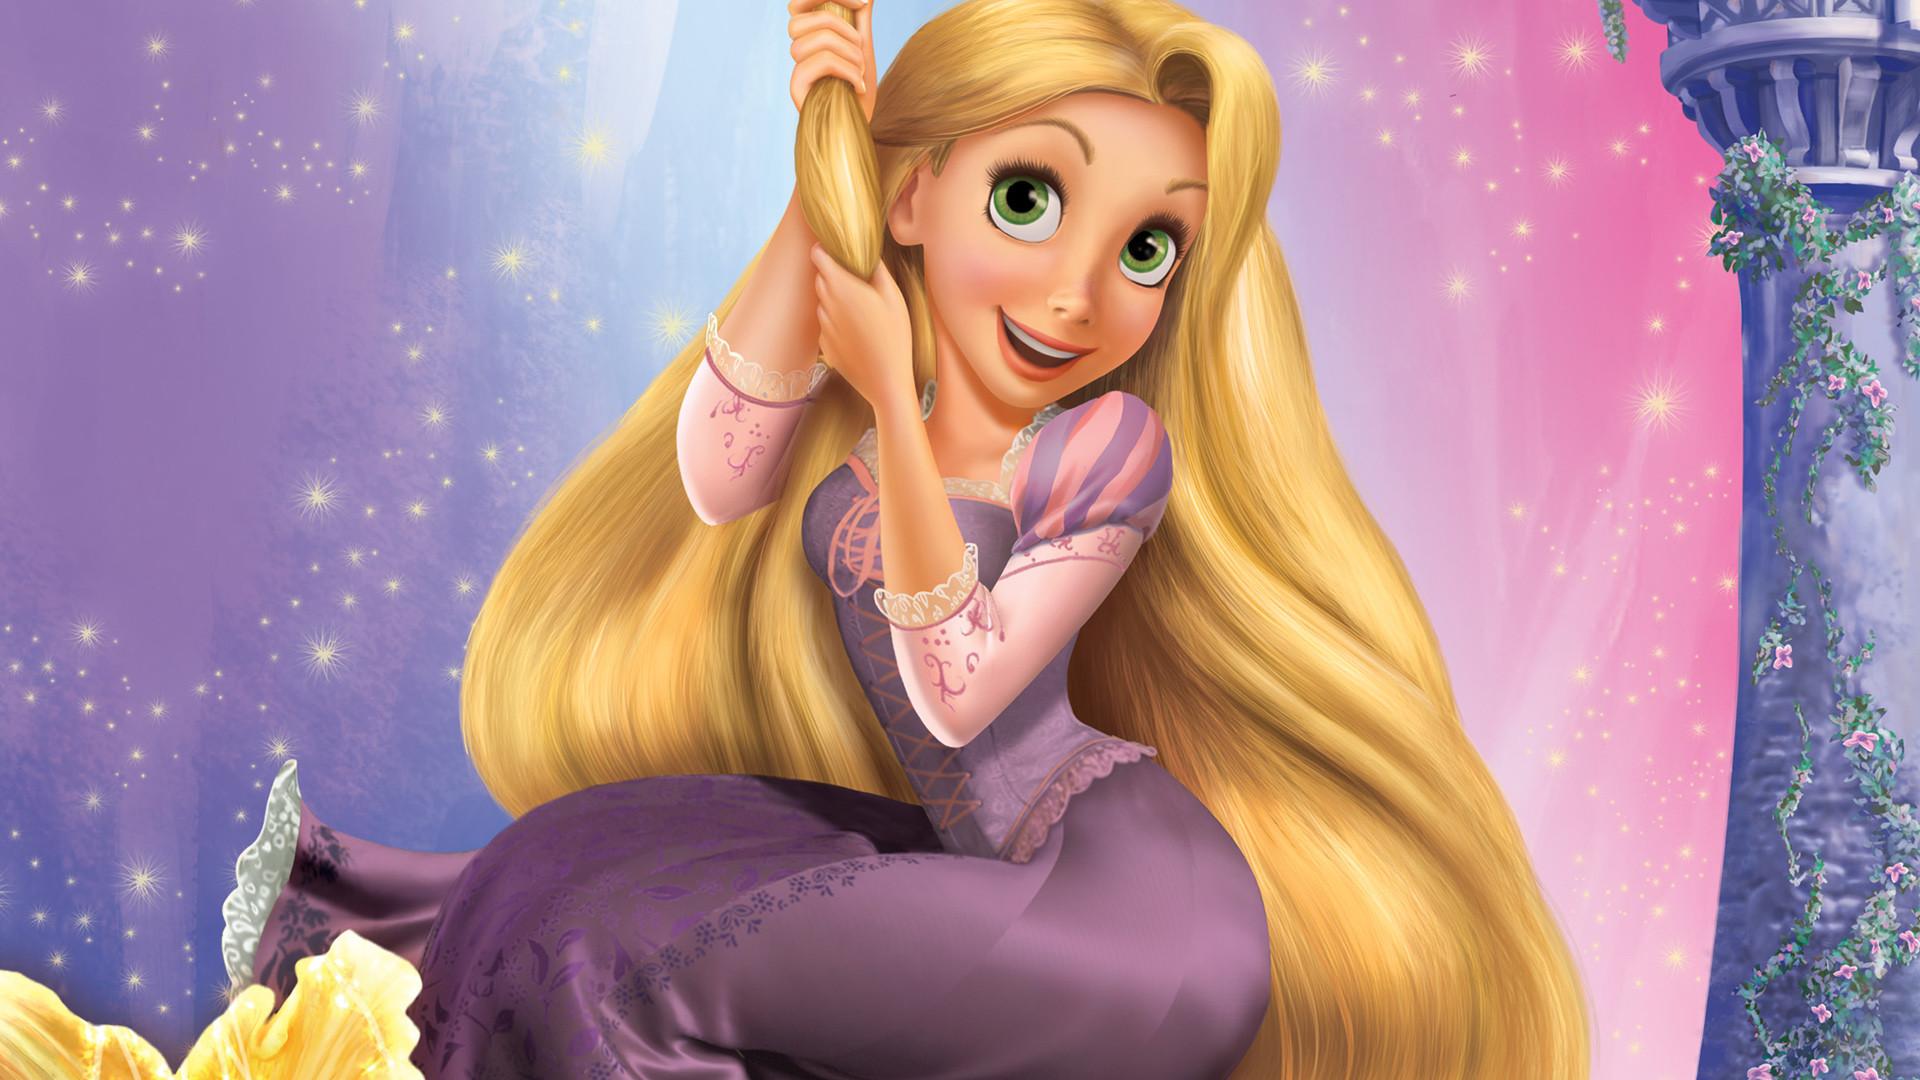 Rapunzel wallpaper hd 70 images - Rapunzel pictures download ...